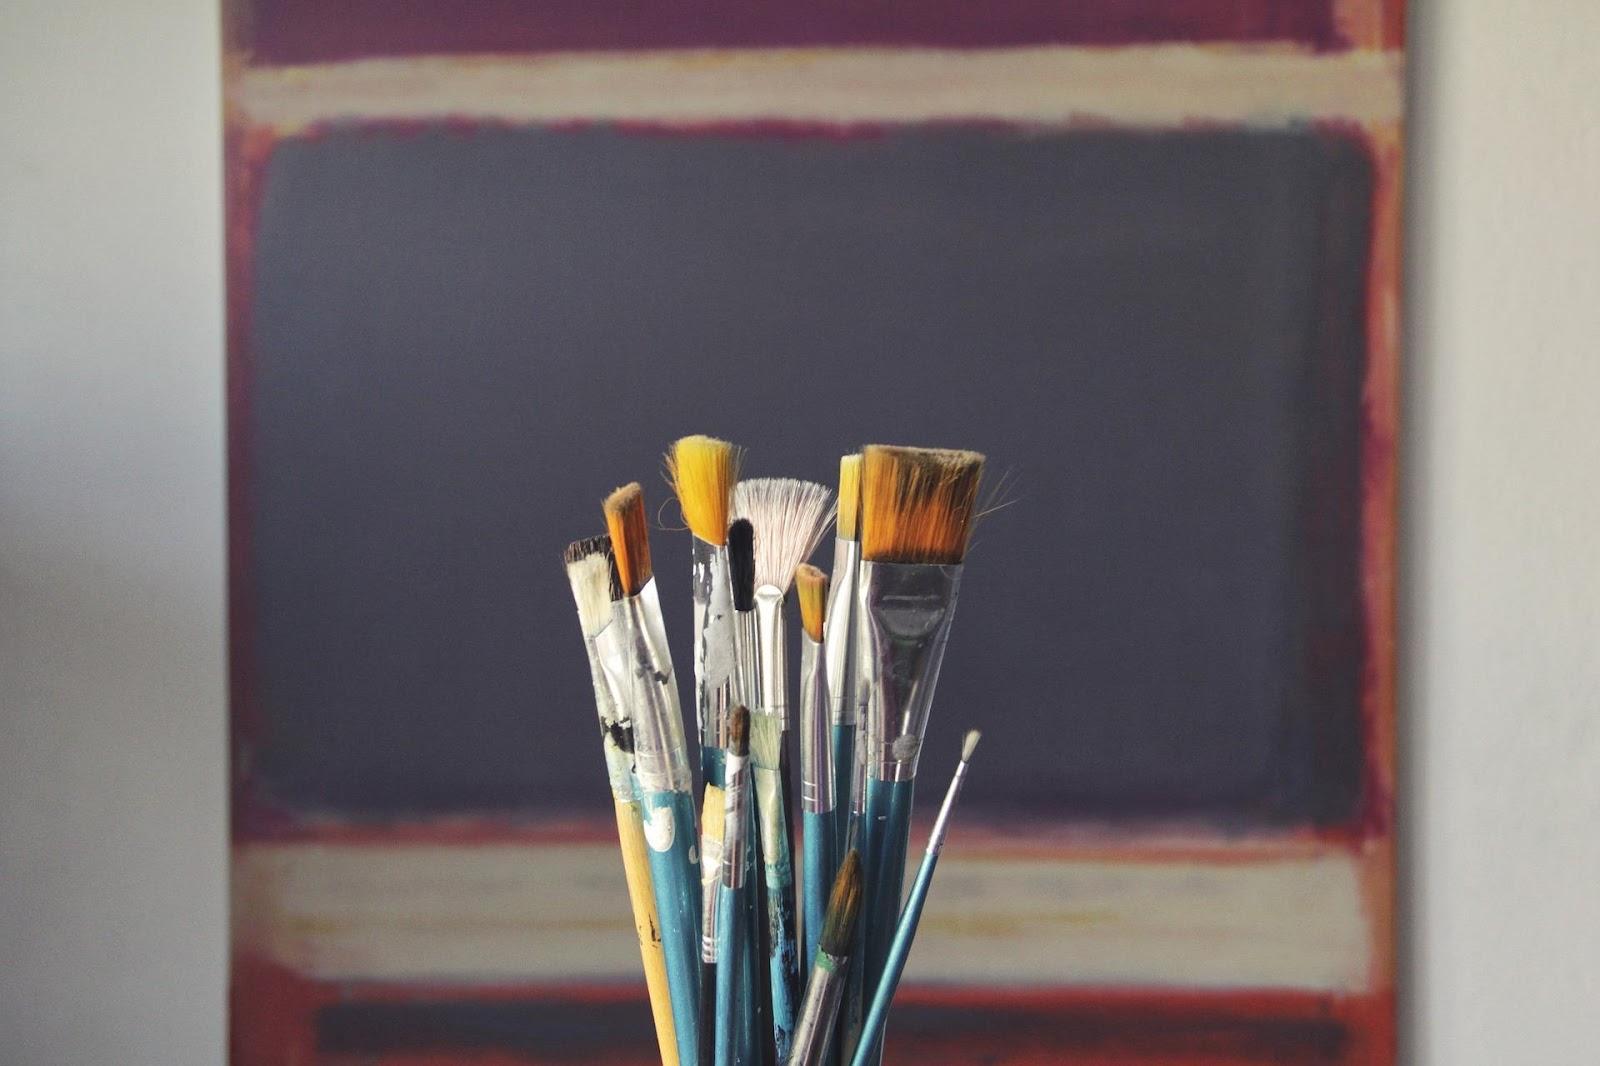 brush-1683134_1920.jpg